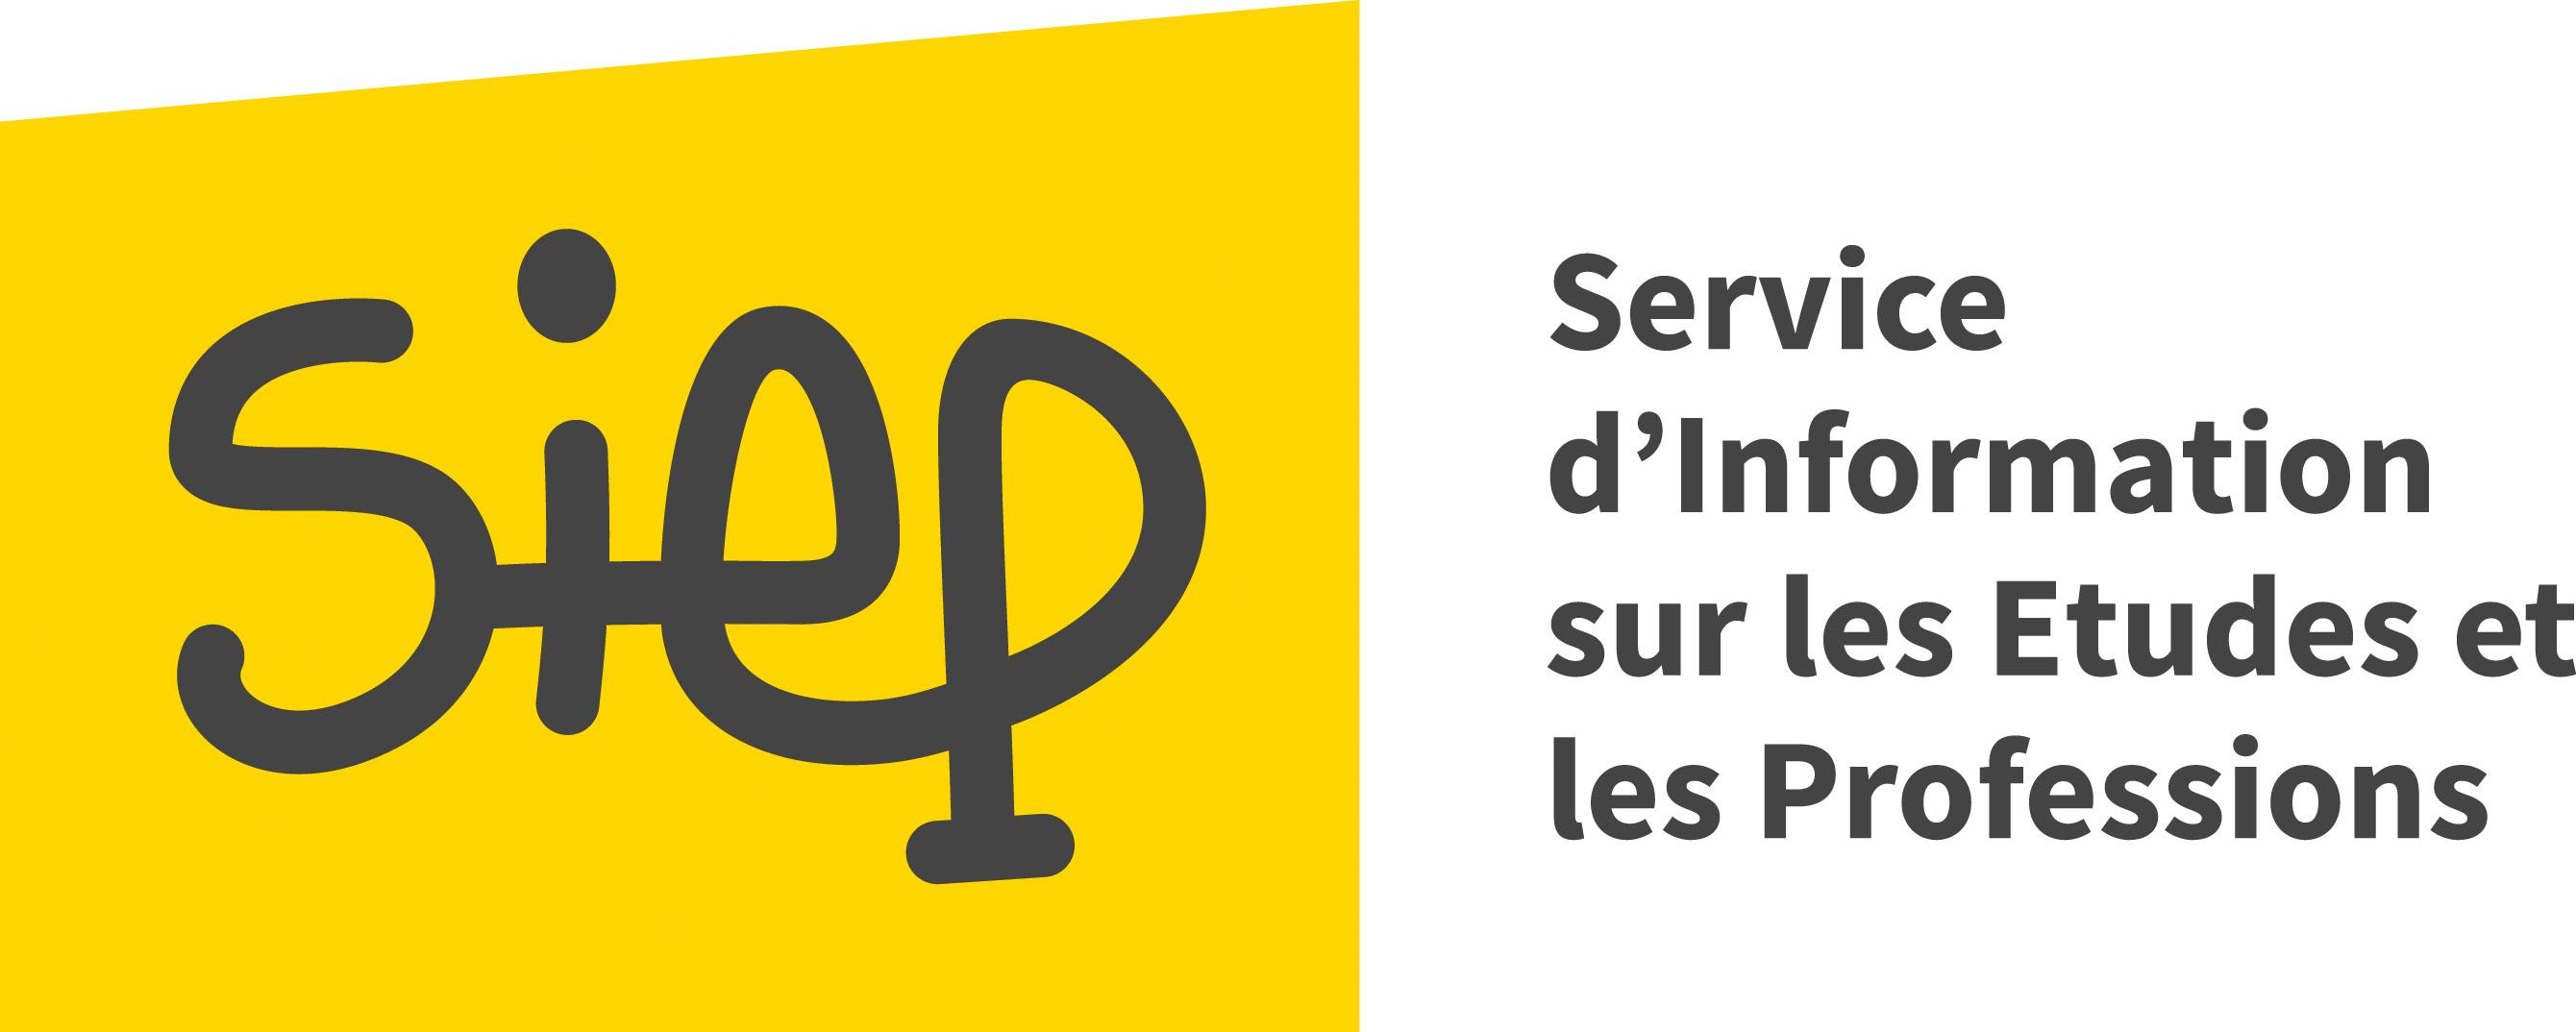 SIEP - Service d